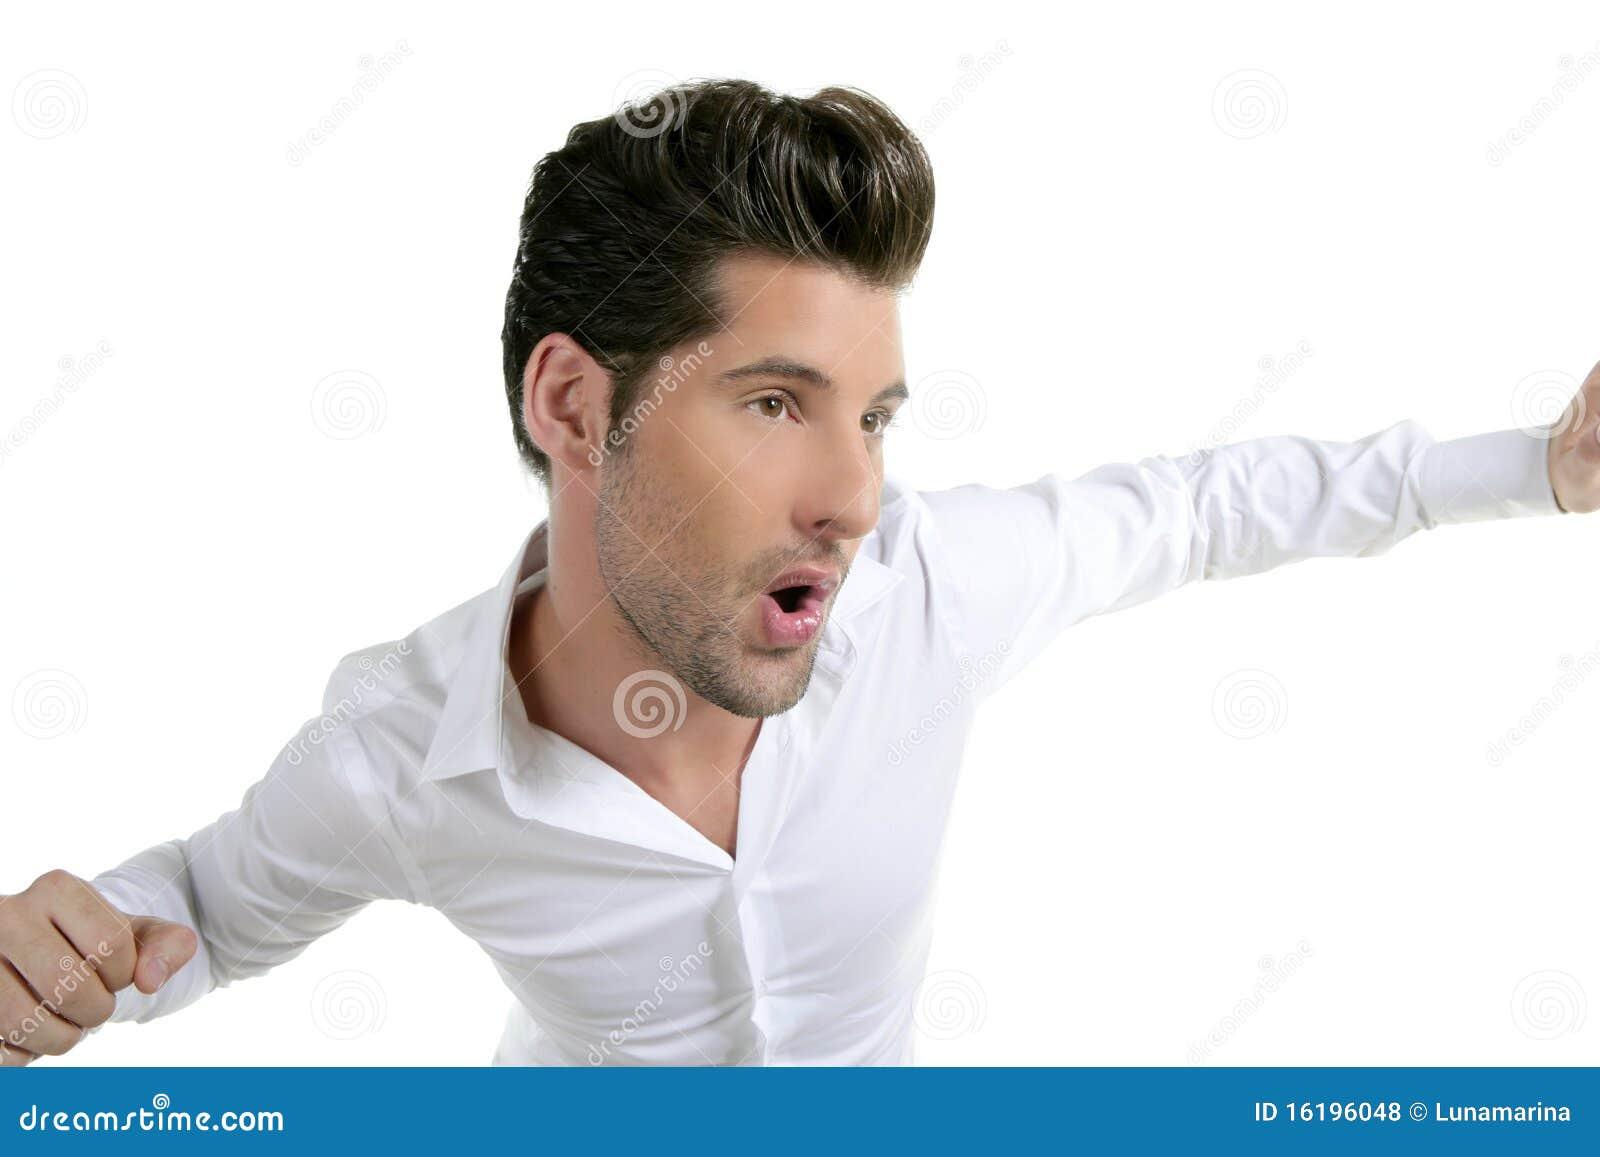 male models dancing funny